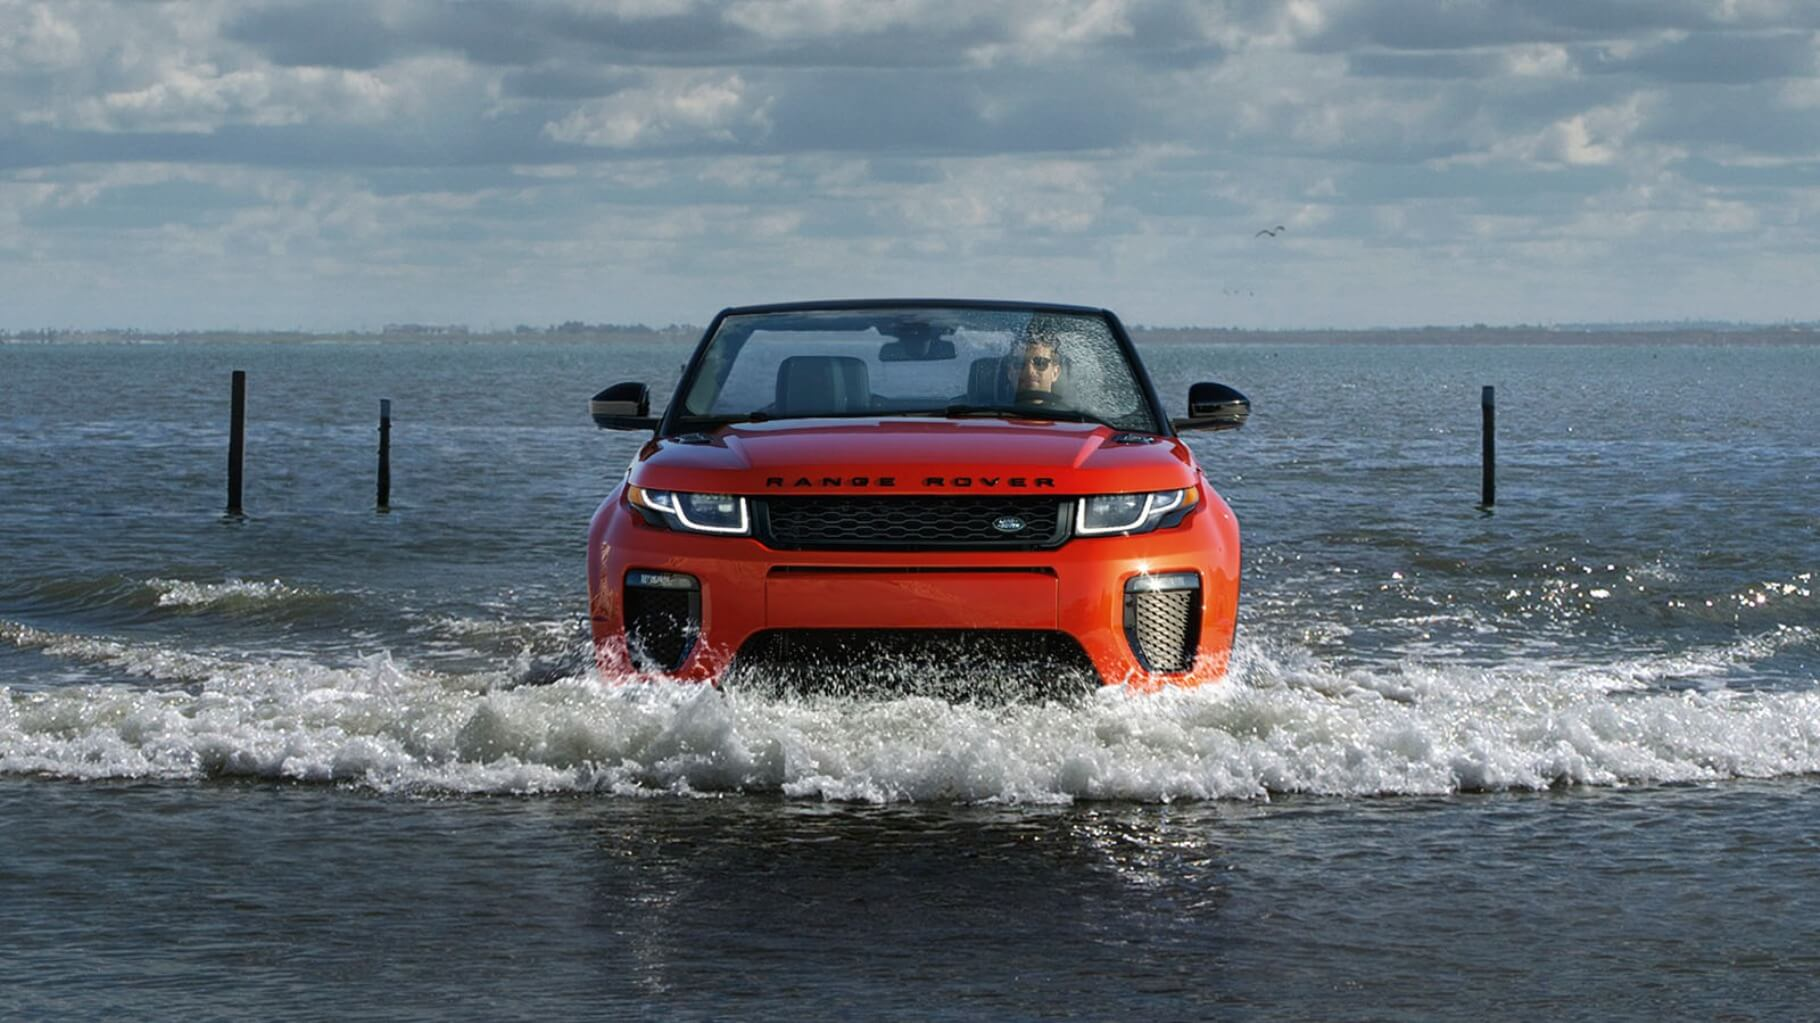 2017 Land Rover Range Rover Evoque Evokes Pure Luxury